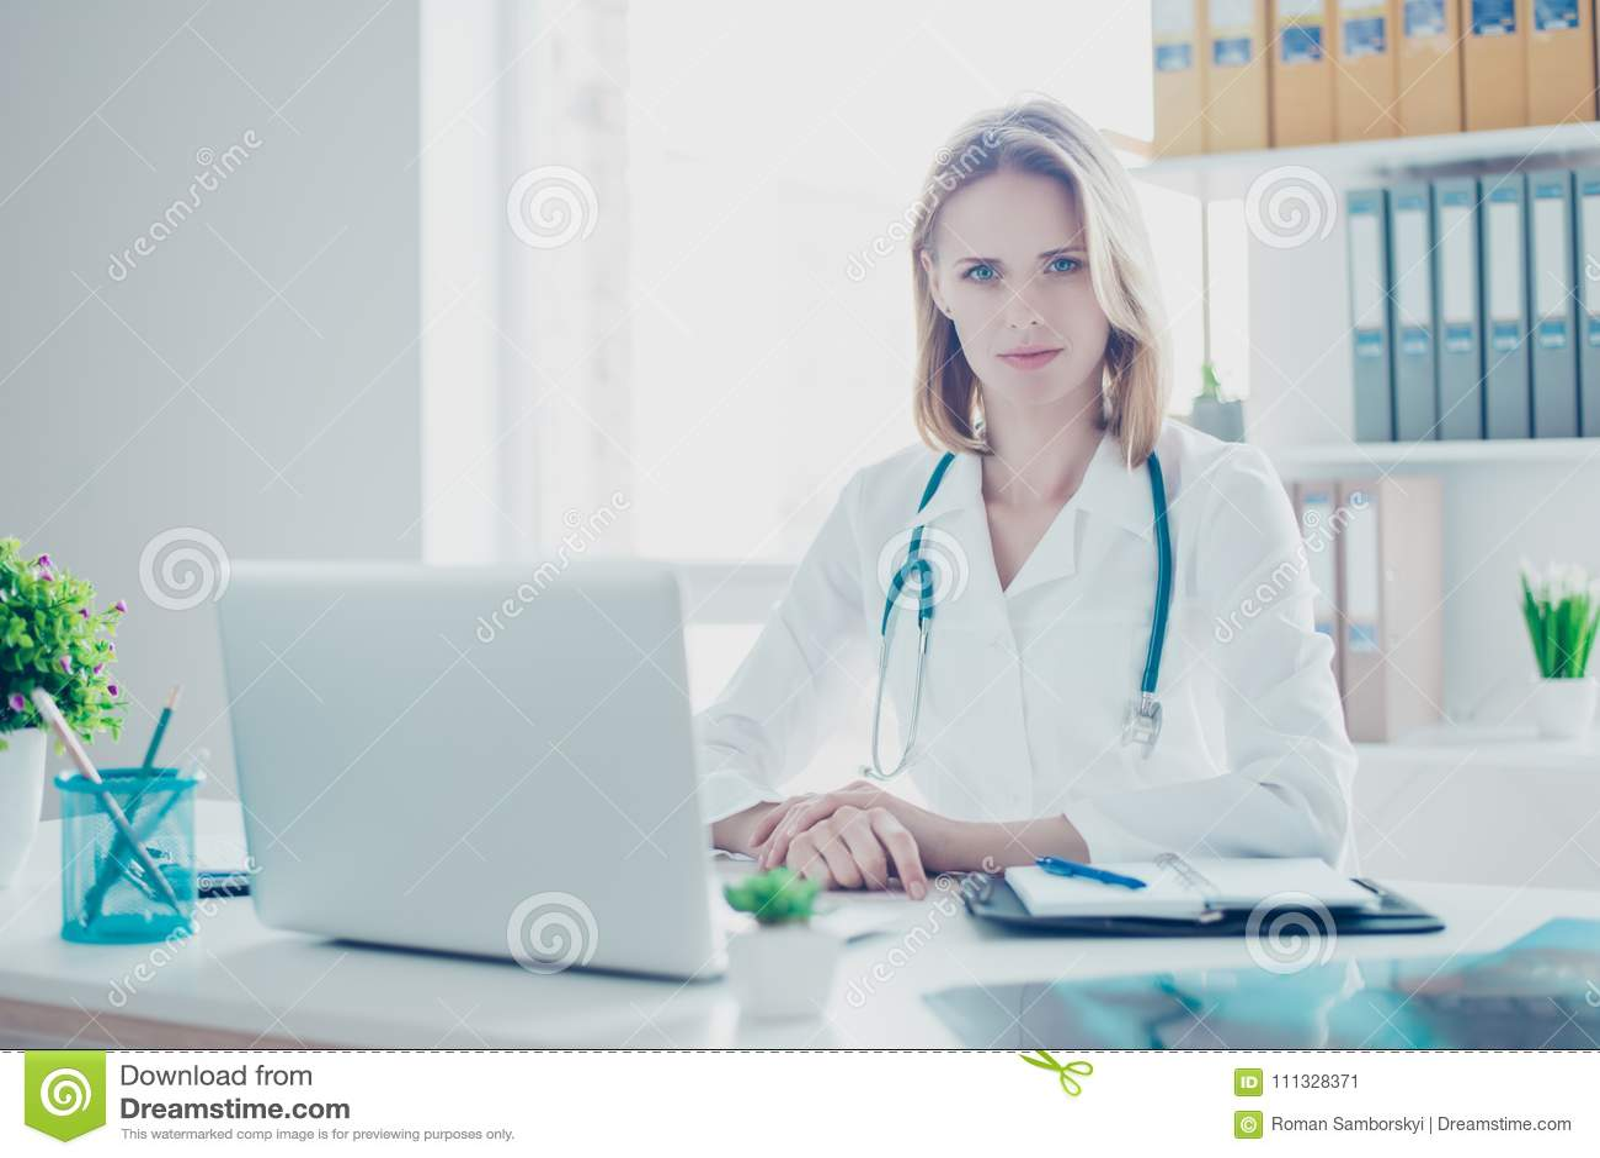 Retrato da estudante de medicina concentrada segura que veste o revestimento branco, sh